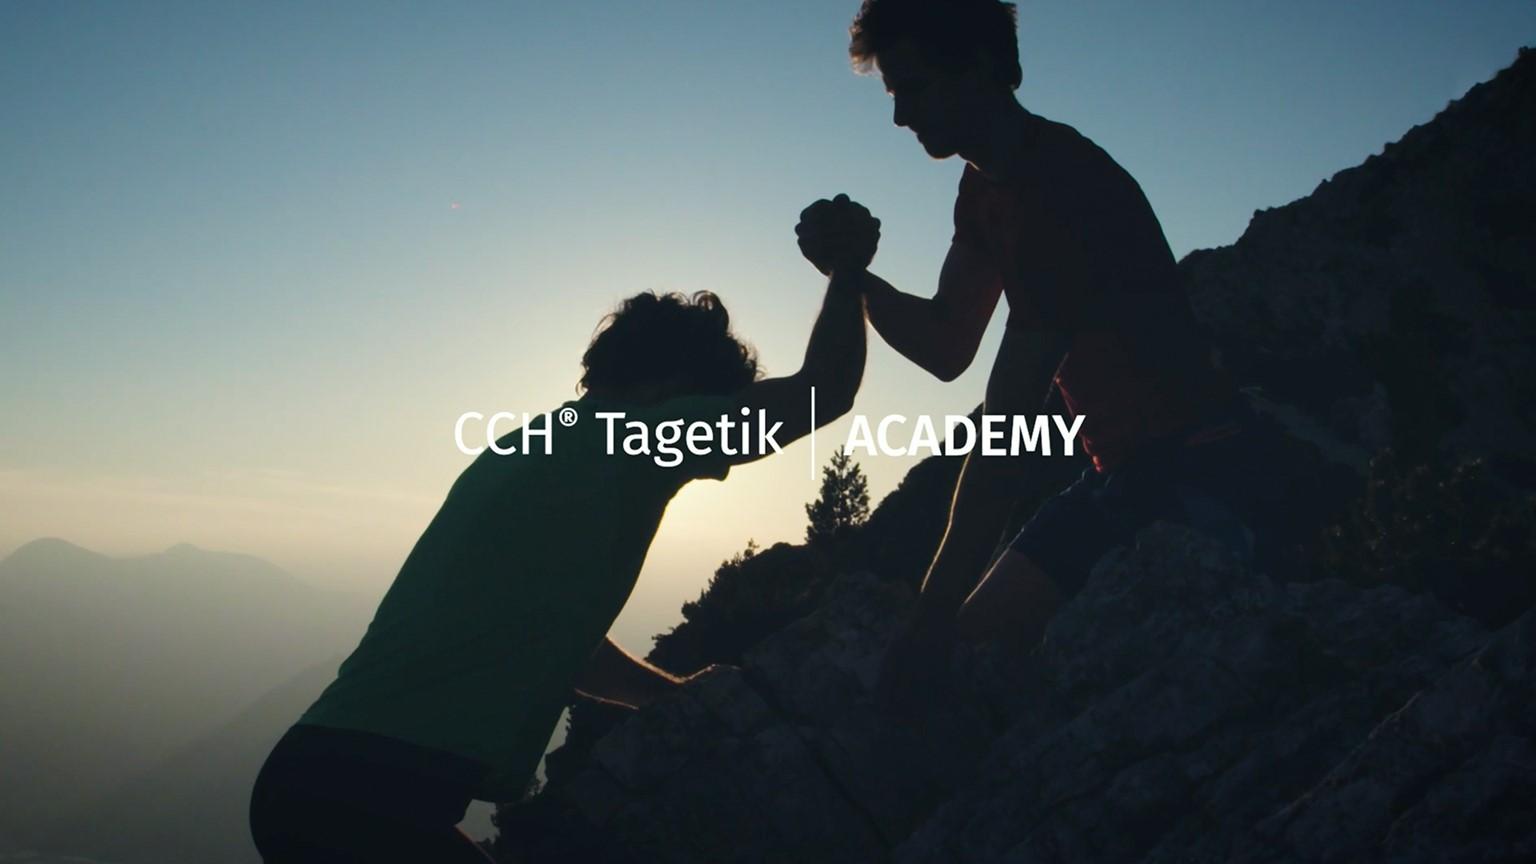 CCH Tagetik Academy